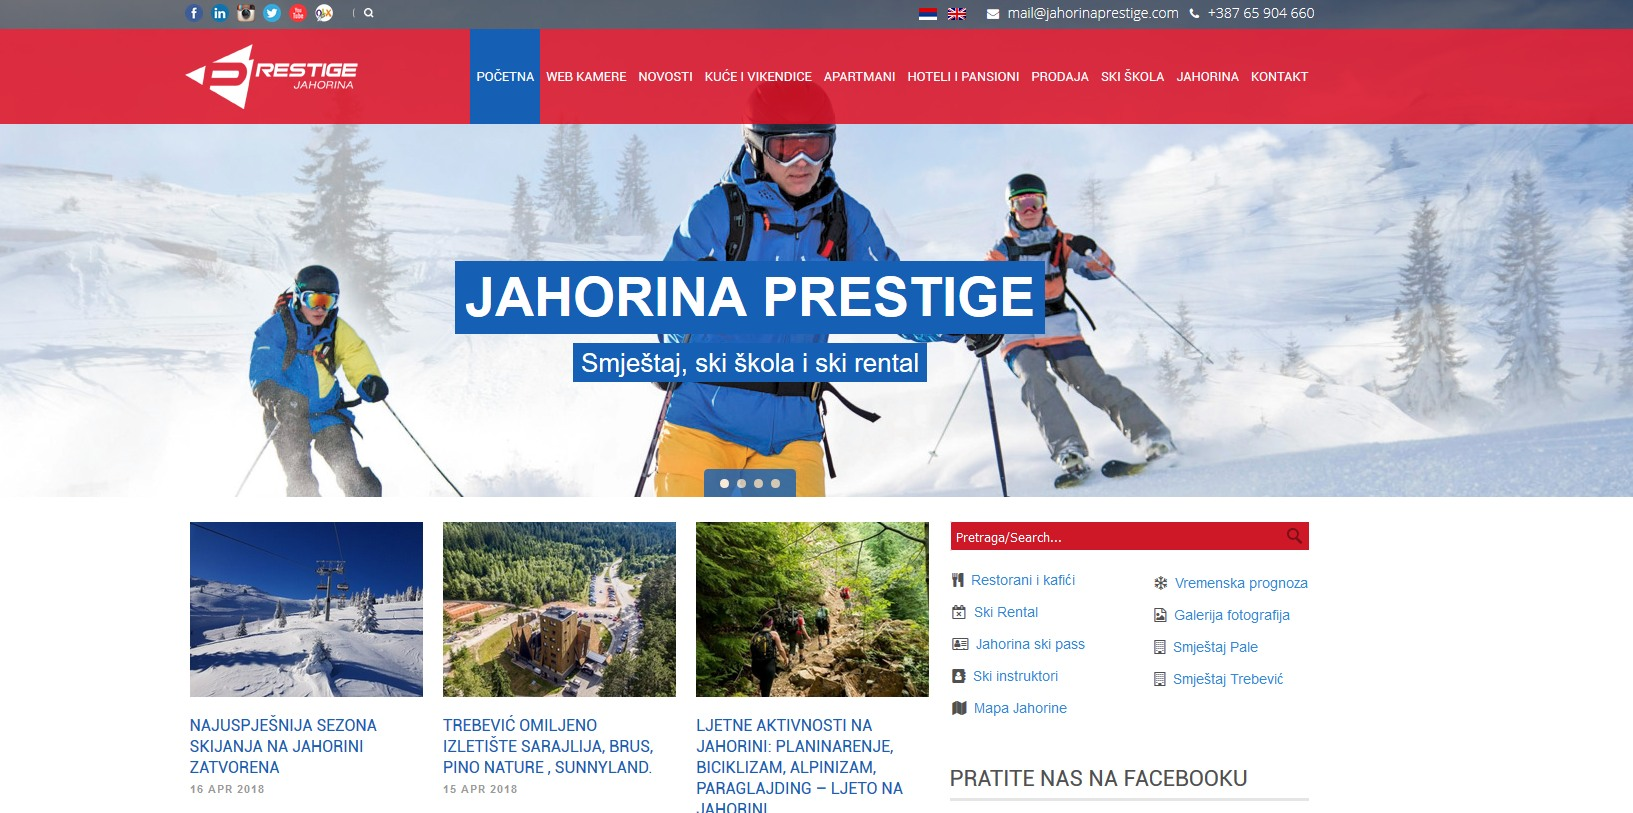 Jahorina prestige